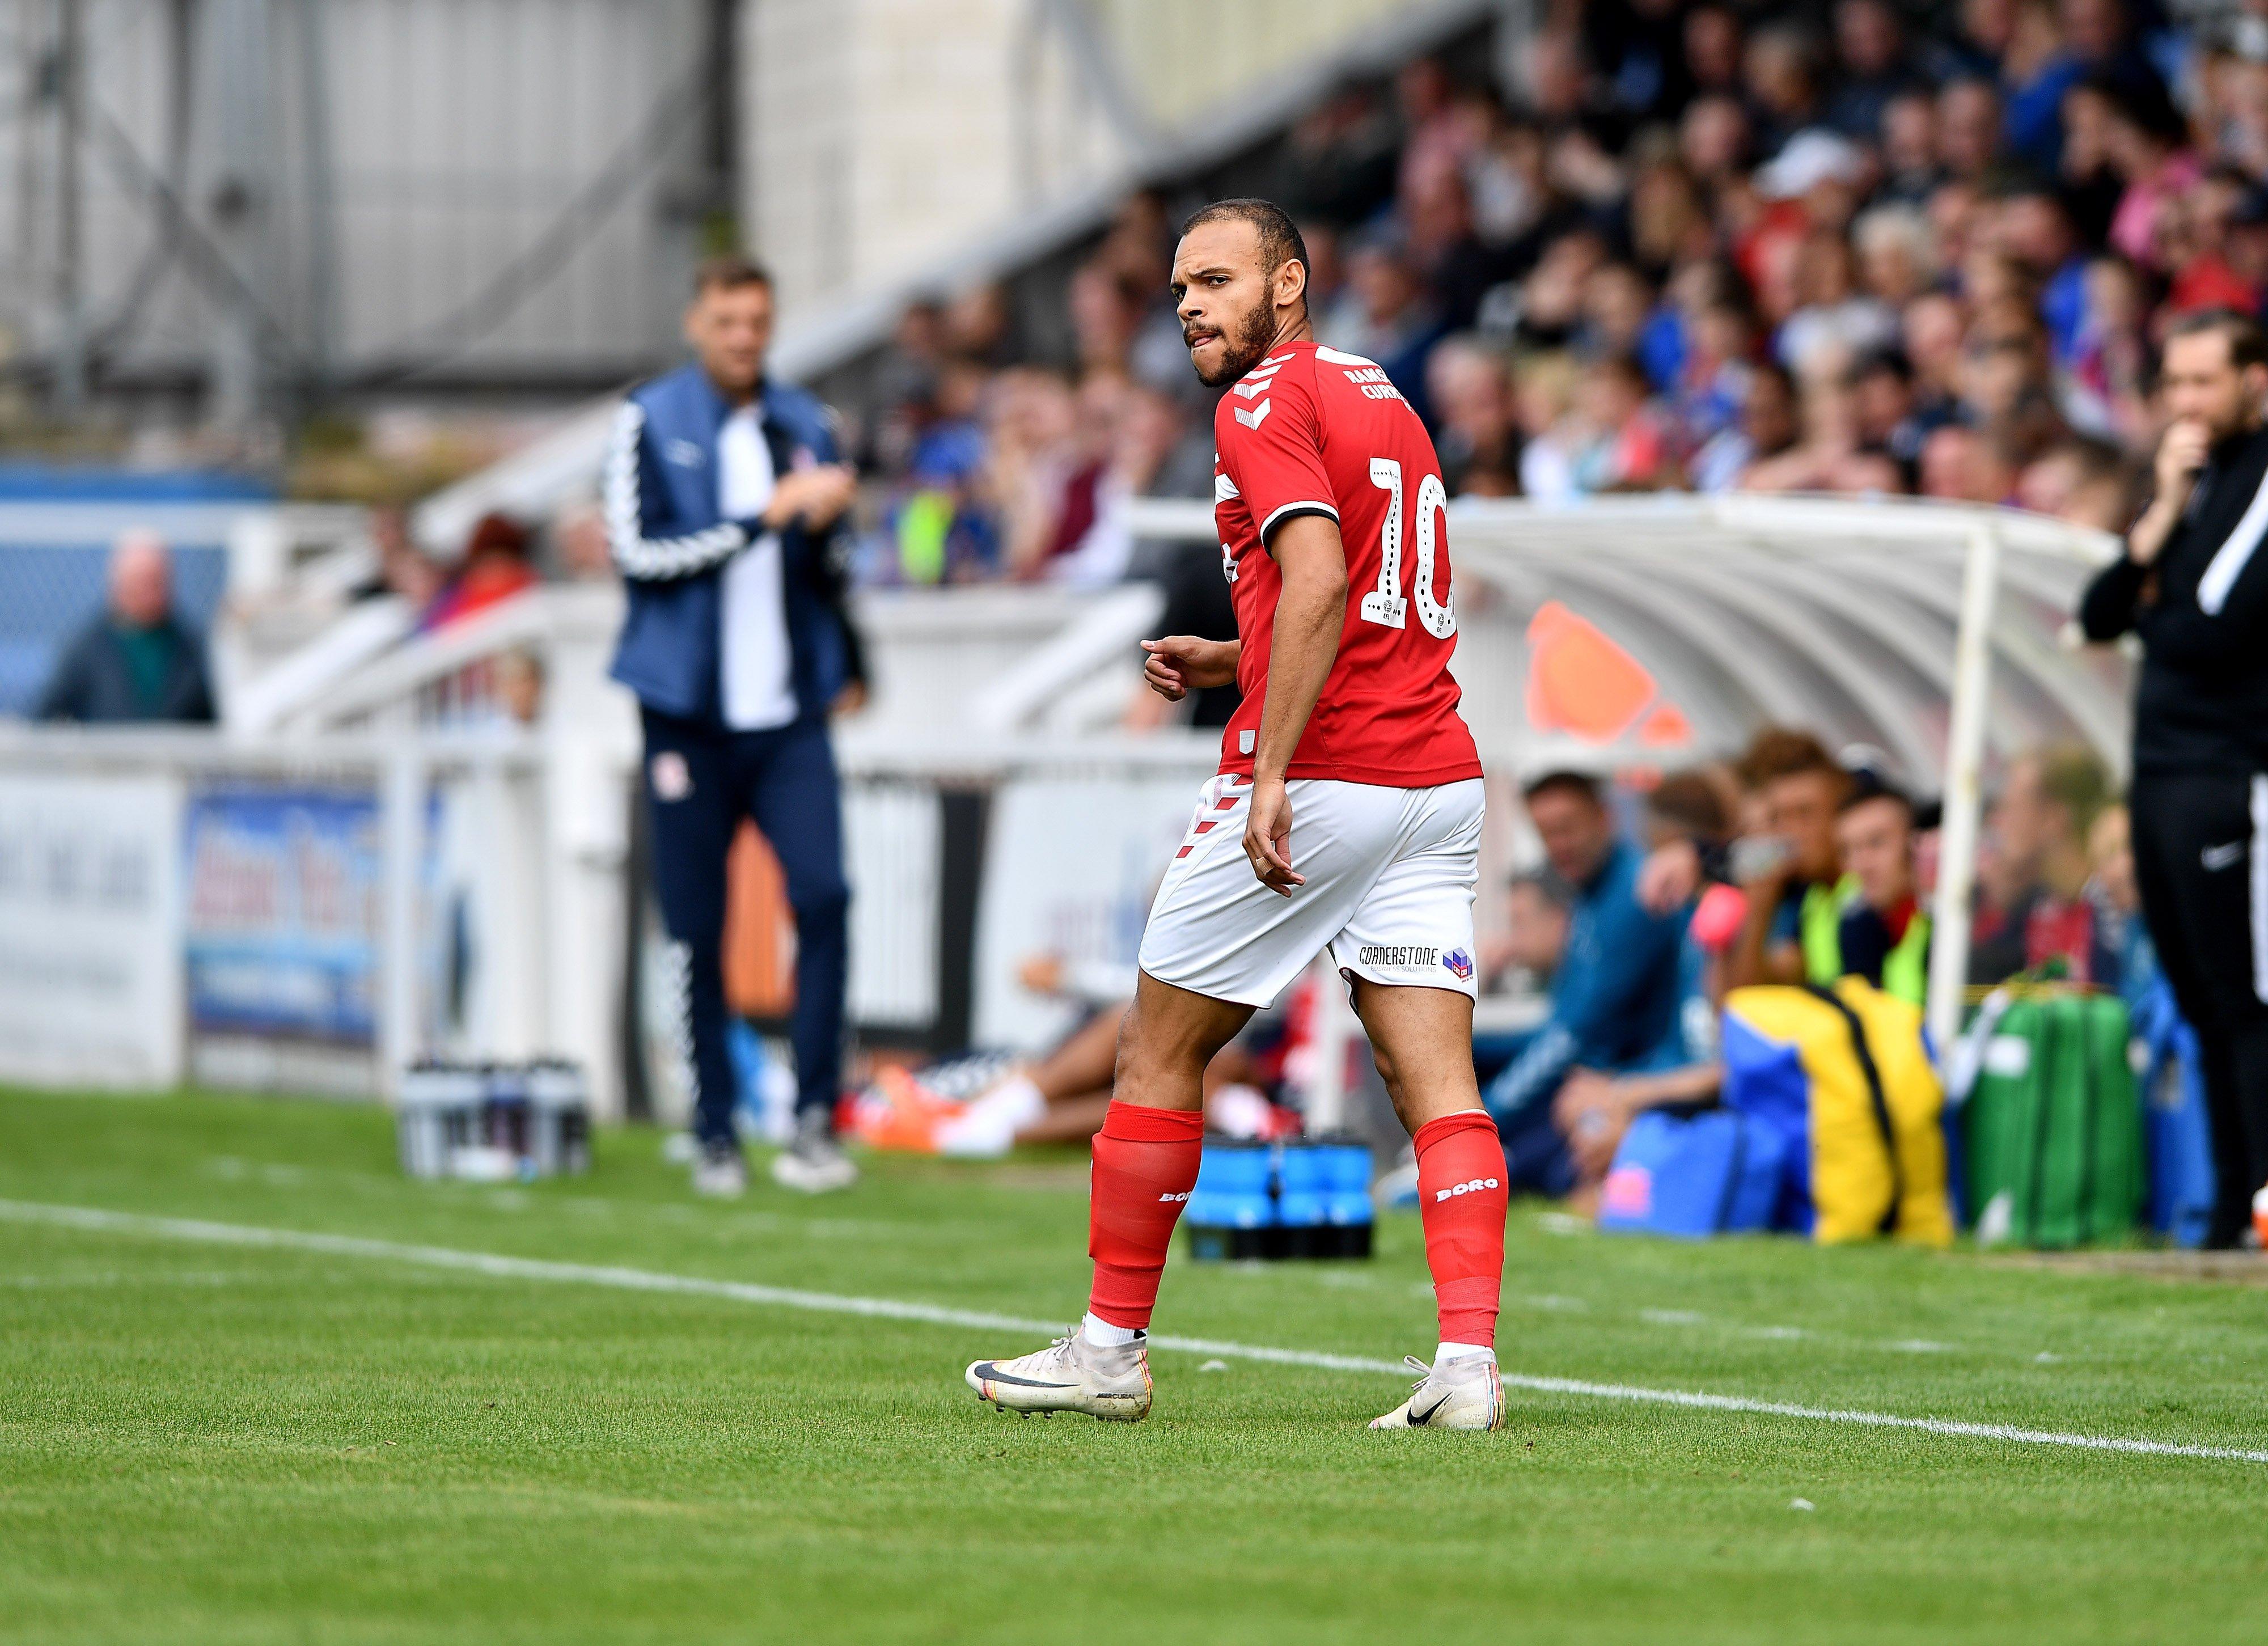 Middlesbrough FC transfer news: Jonathan Woodgate provides transfer